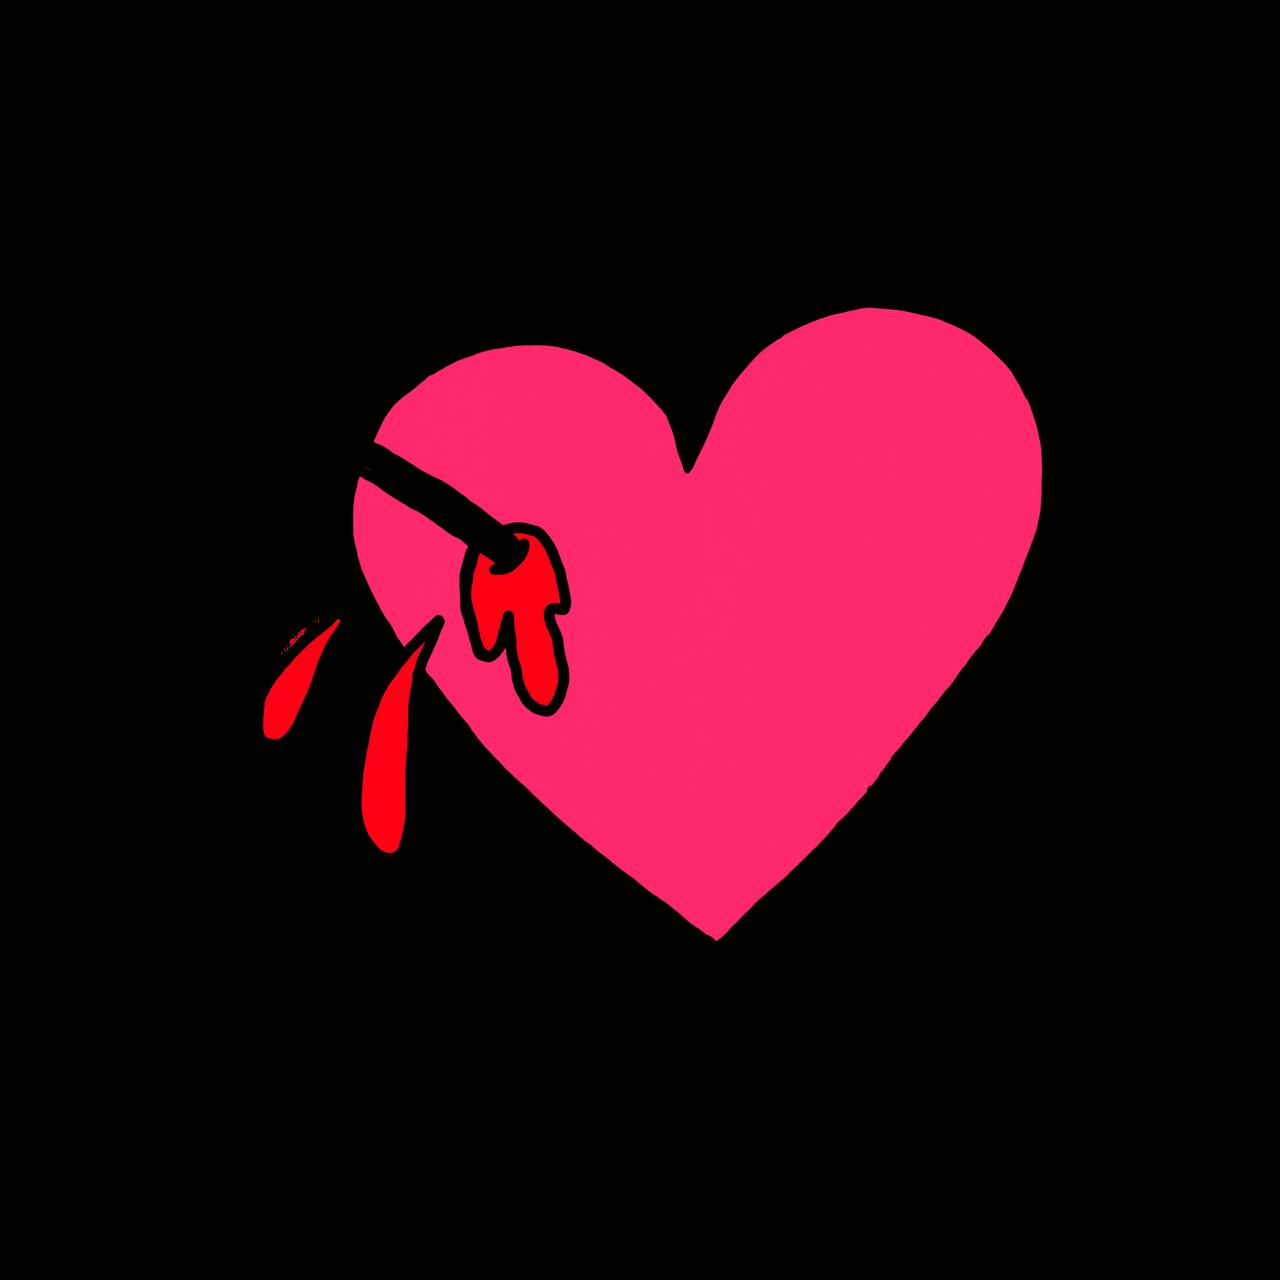 dating site murderer tumblr transparents